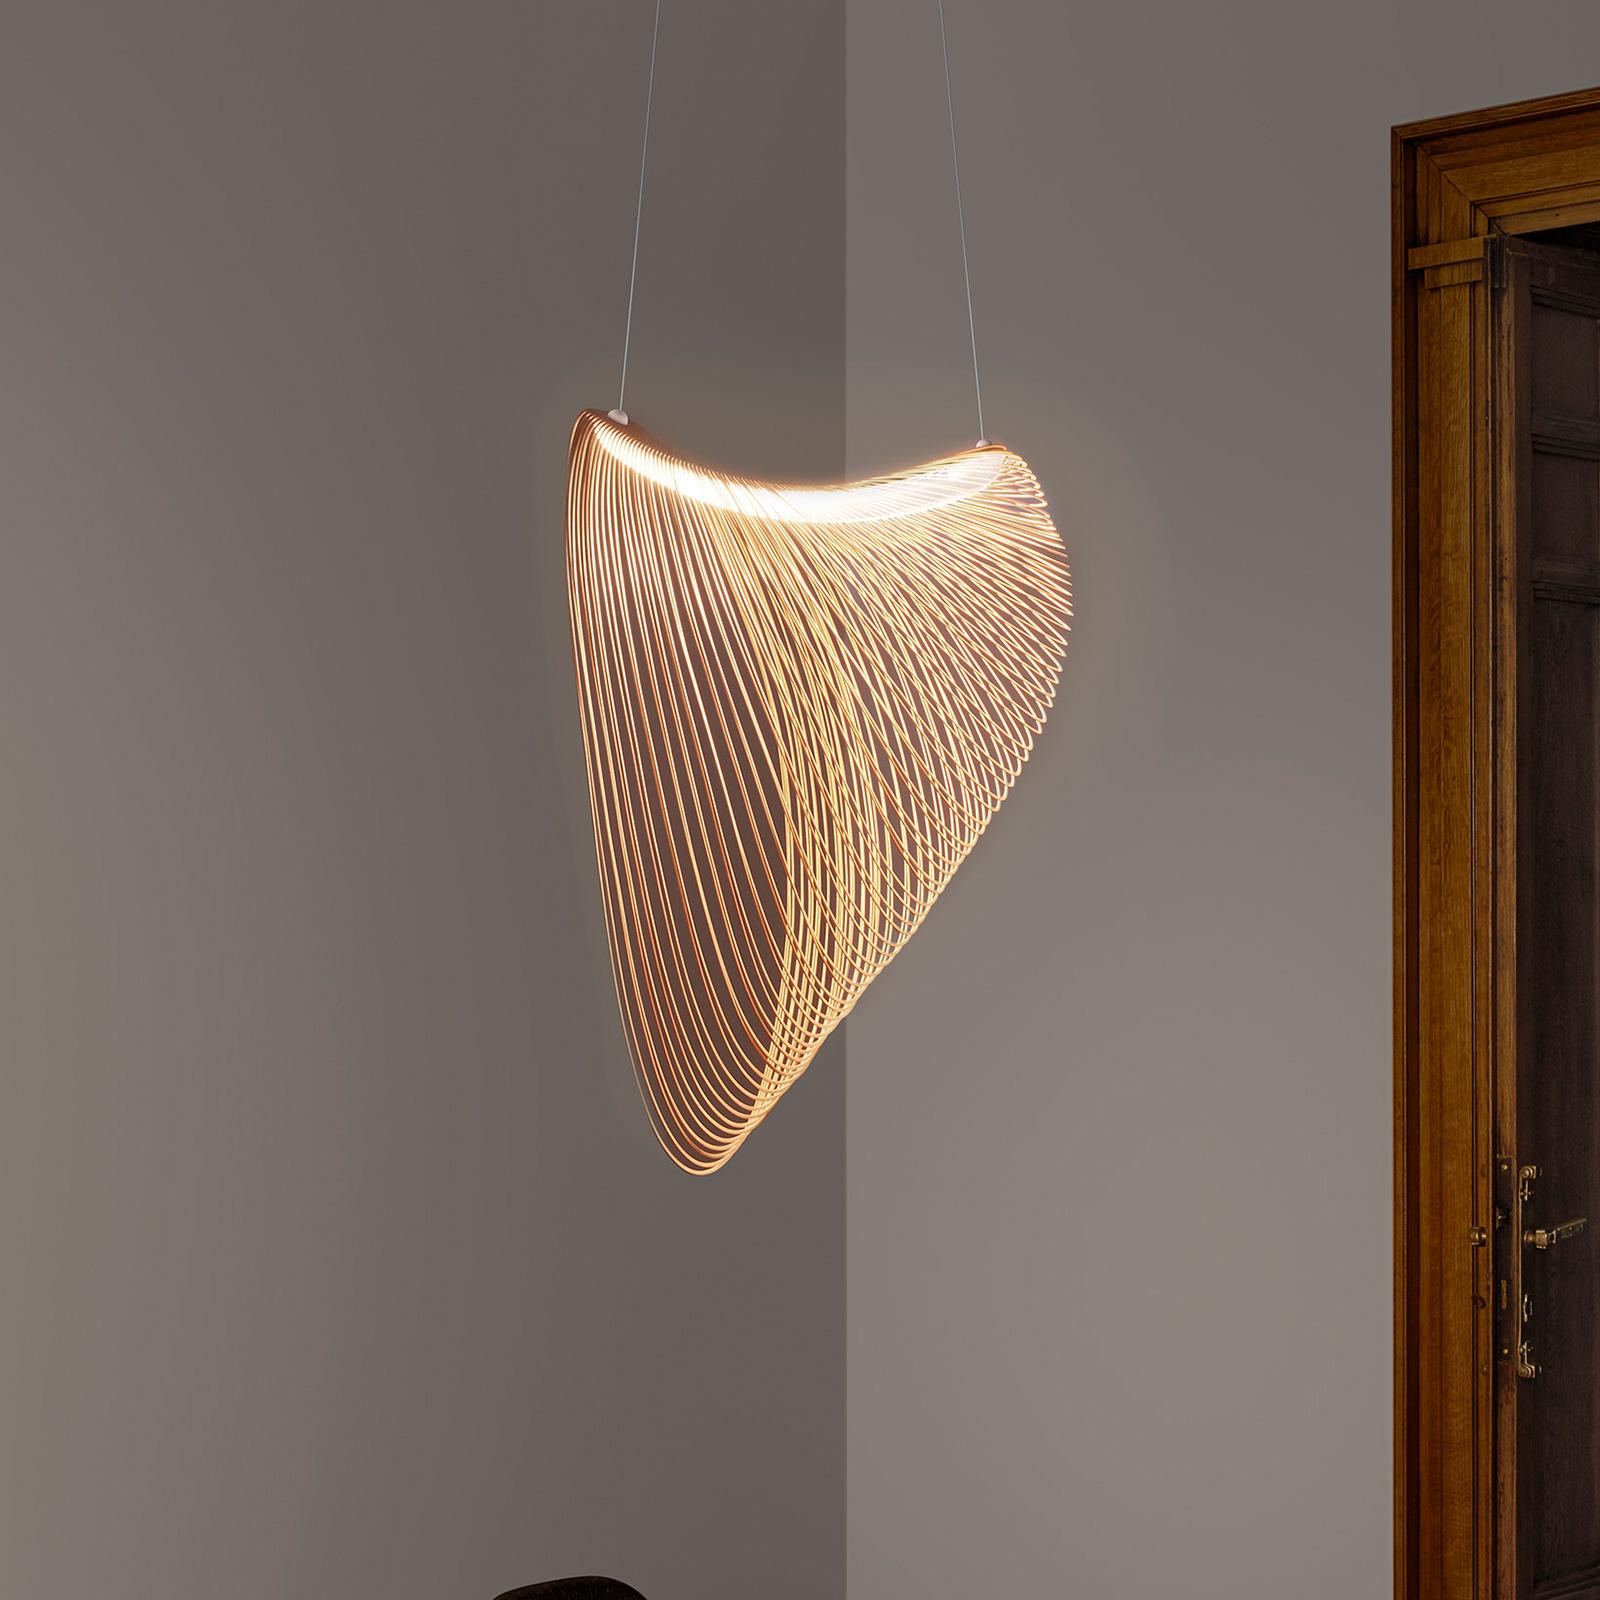 Luceplan Illan LED-træhængelampe, dæmpes, Ø 60 cm